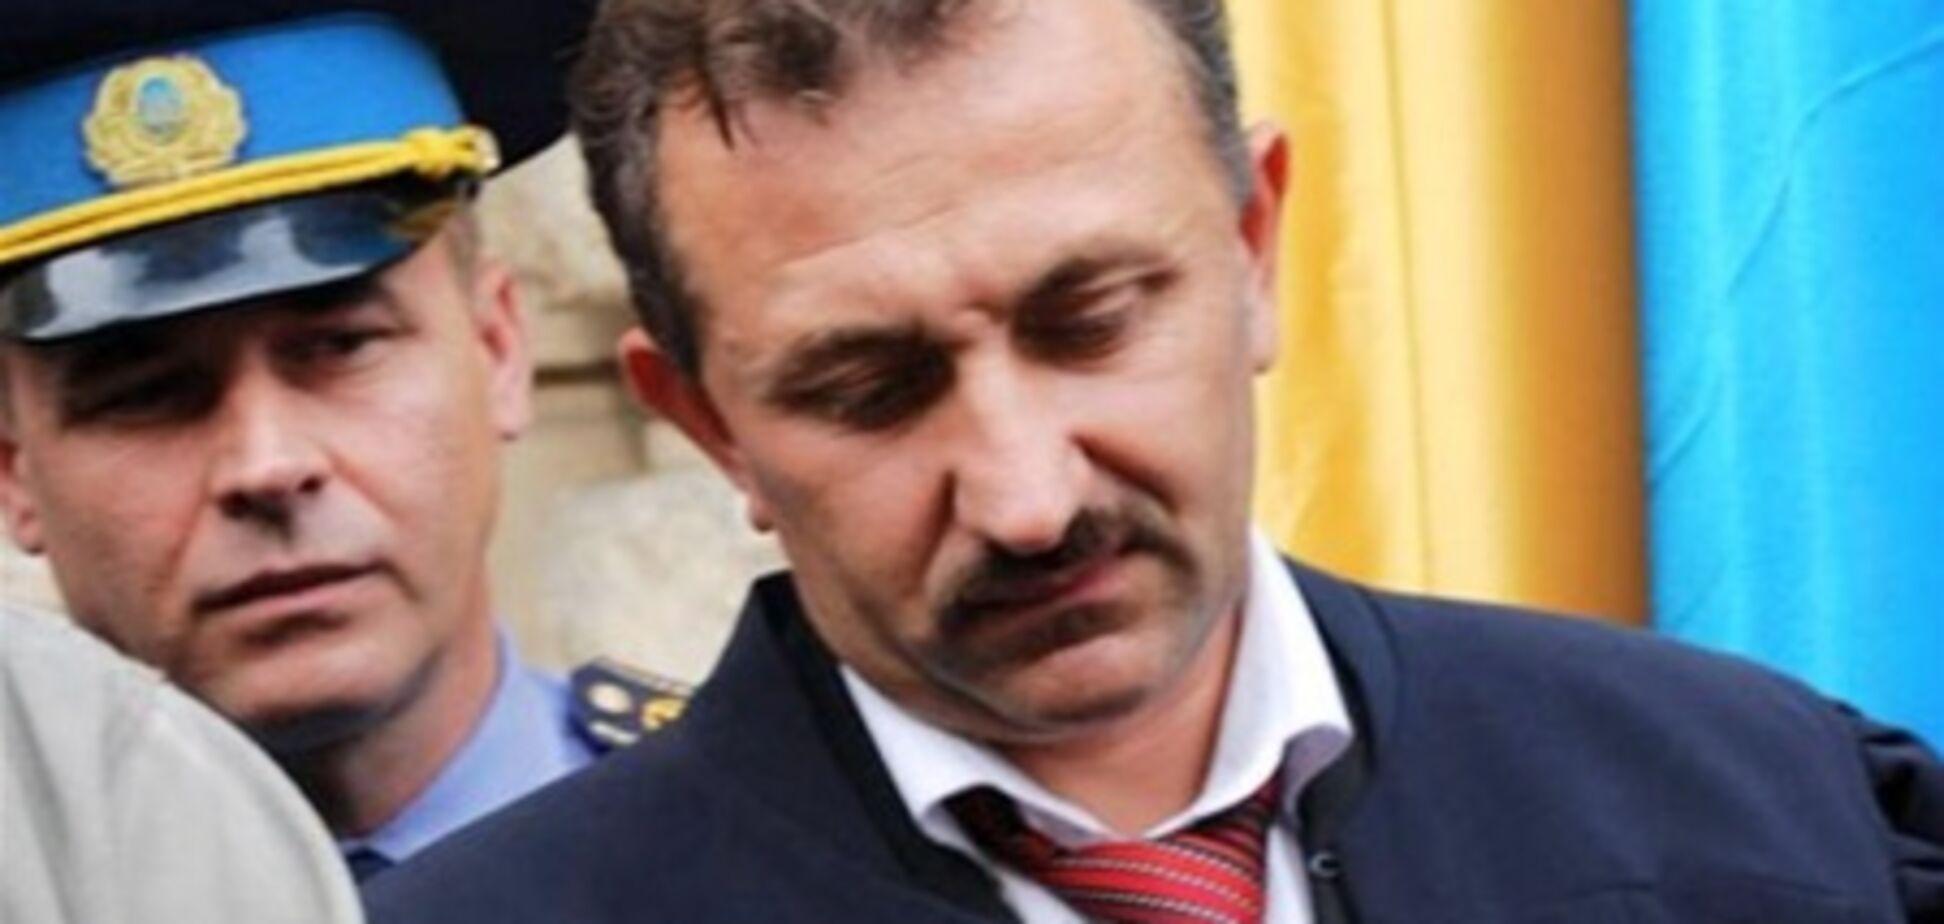 Суддя-колядник Зварич намагався вчинити самогубство